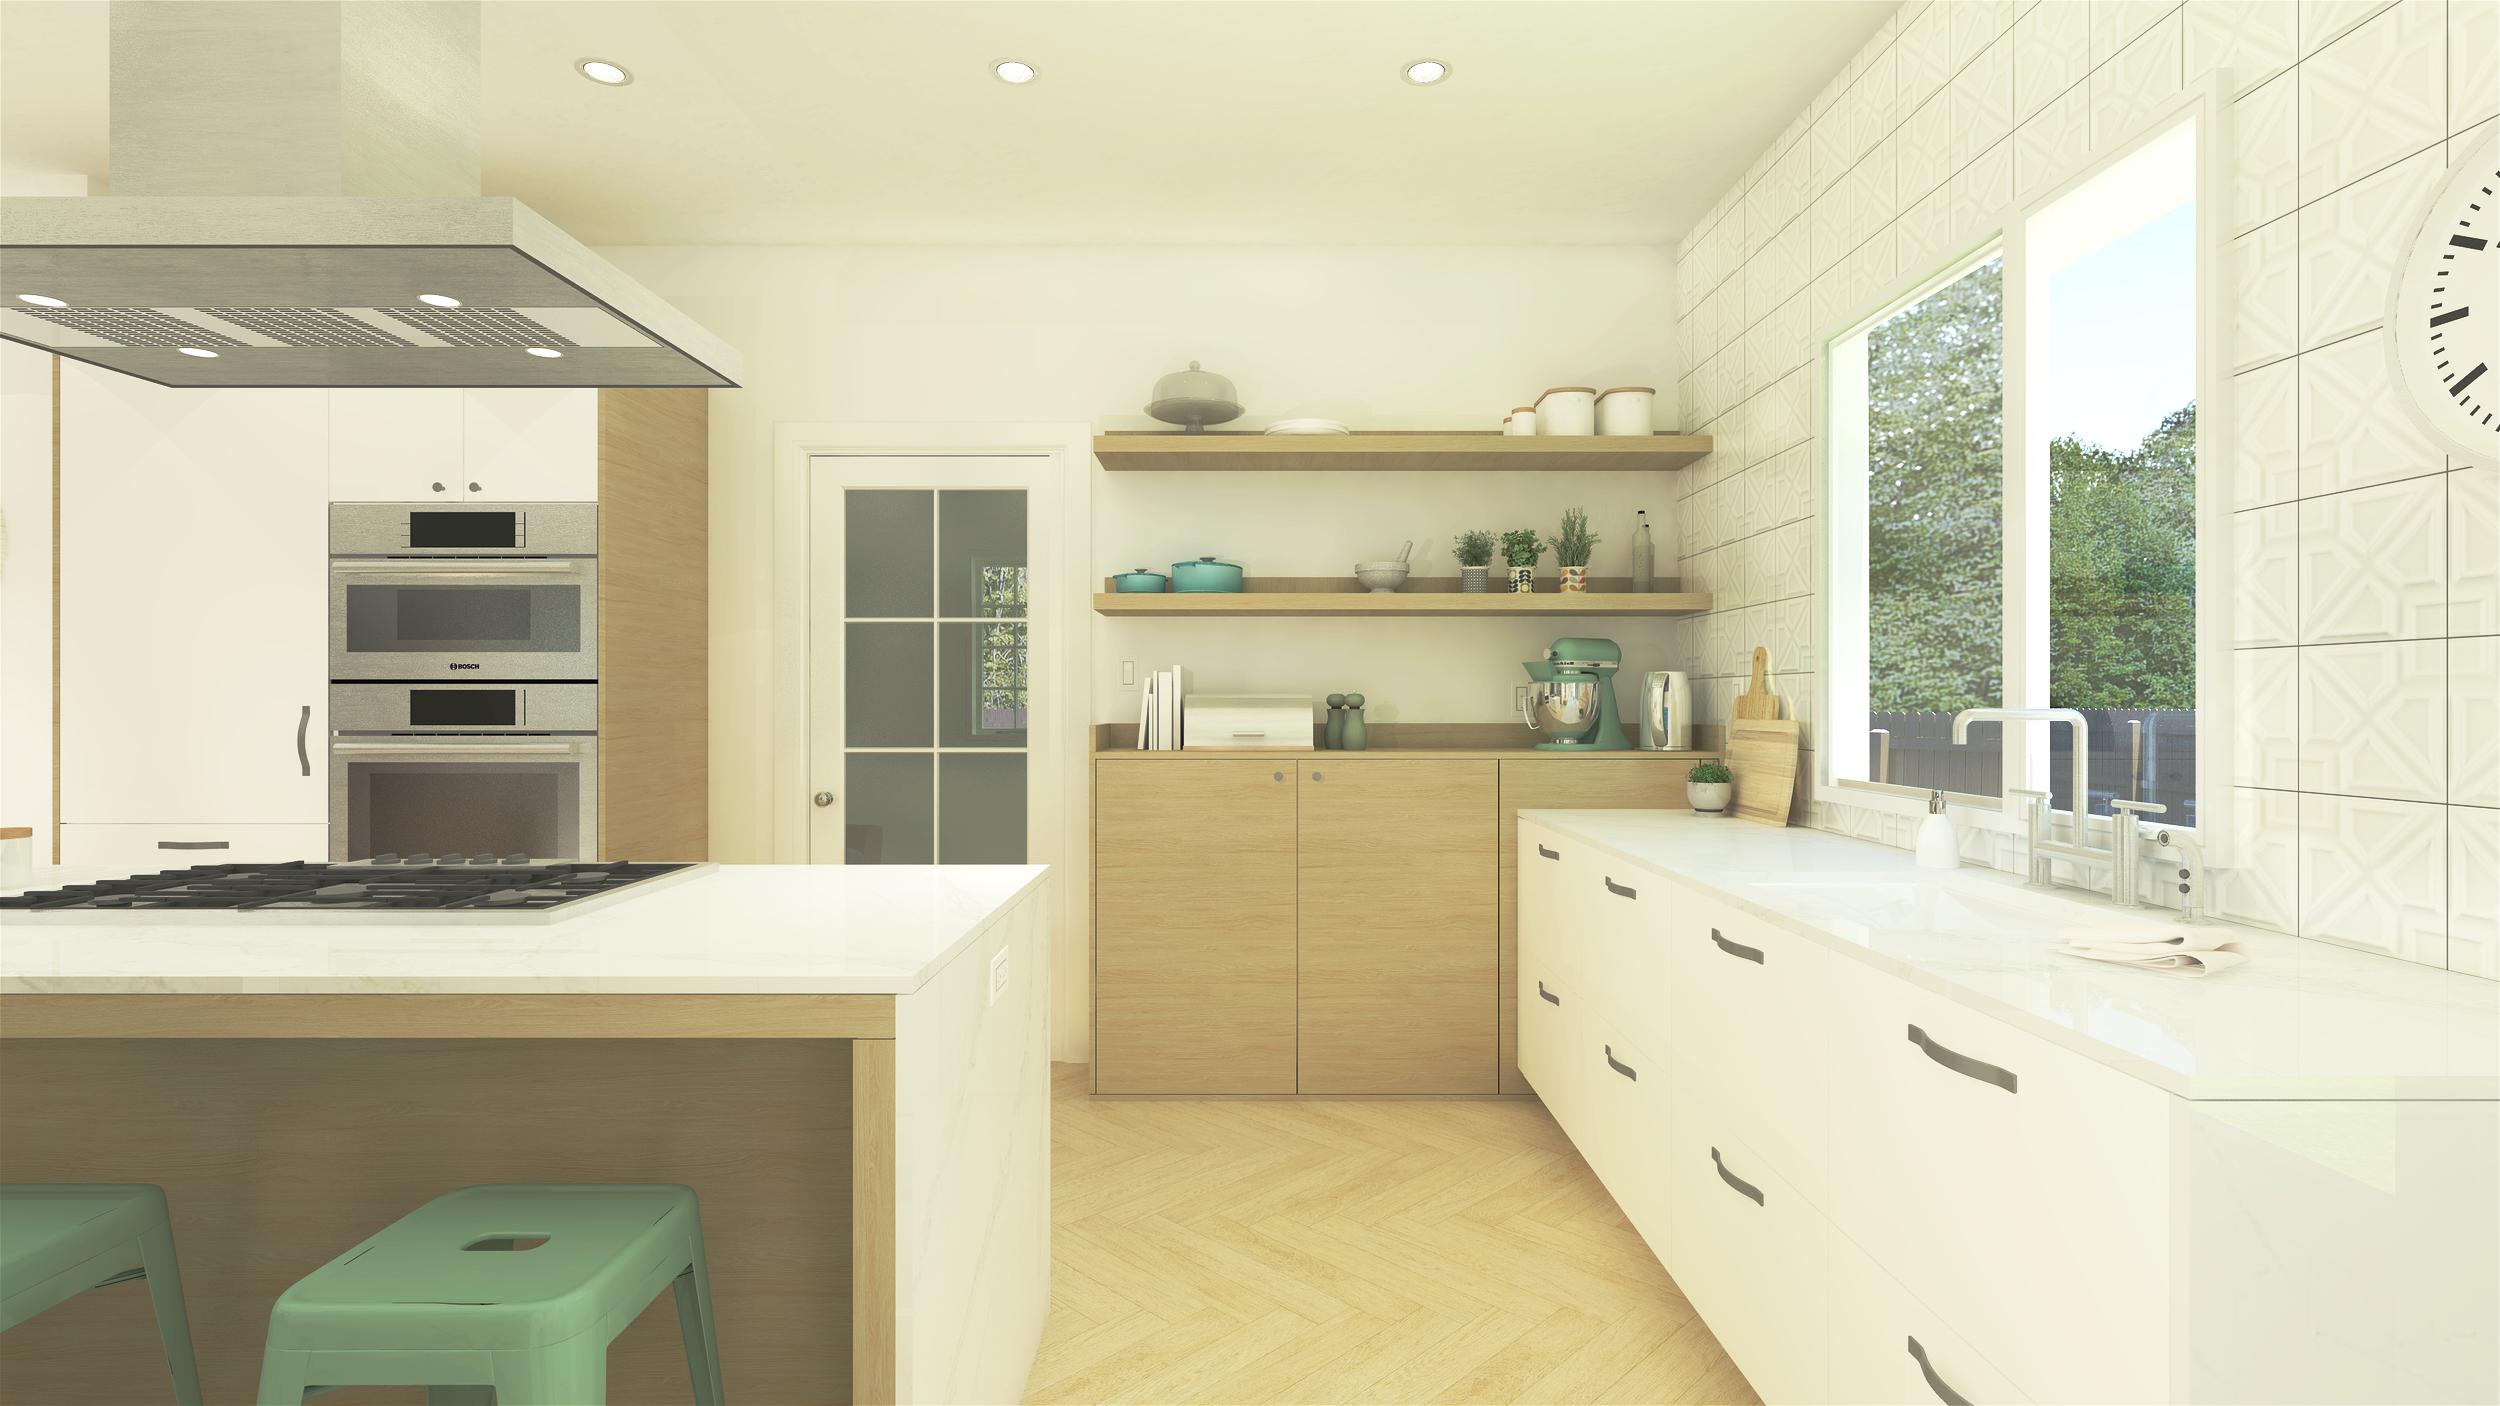 deSousaDESIGN_Kitchen_Modern_Suburbia_V1c_3840x2160.png